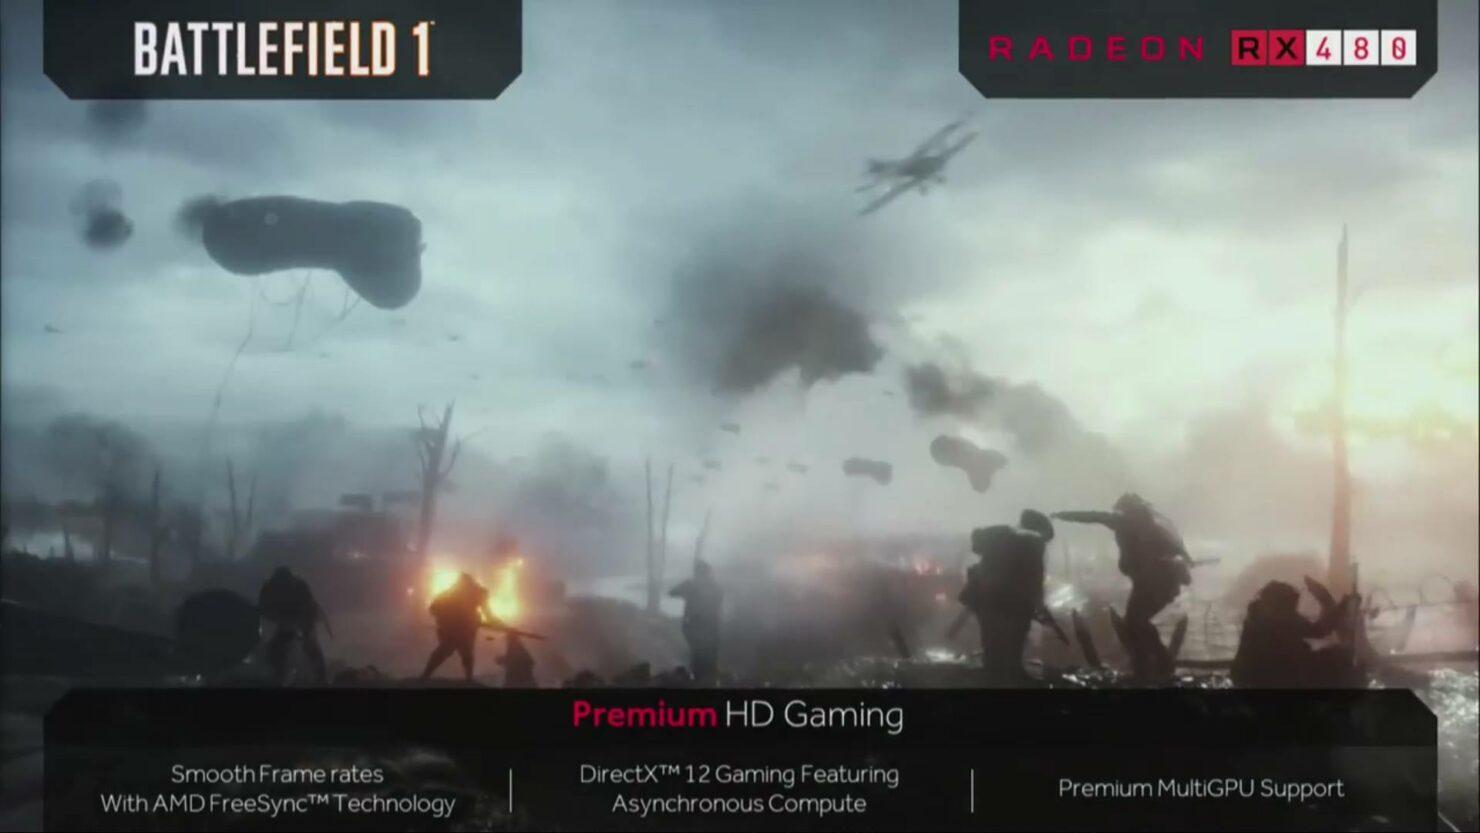 amd-radeon-rx-480-battlefield-1-gaming